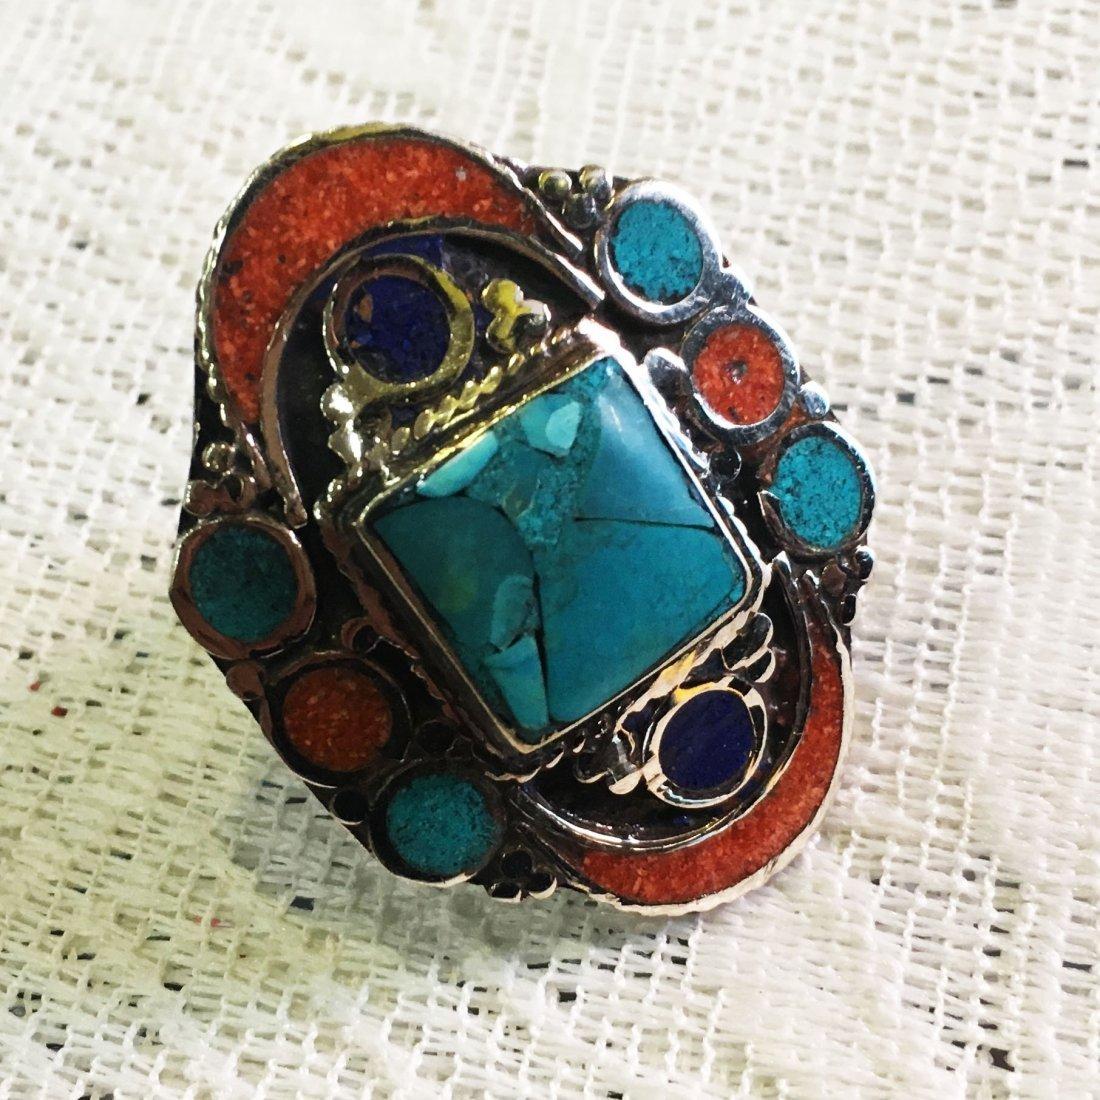 Free size - Vintage Turquoise & Coral Tibetan Ring